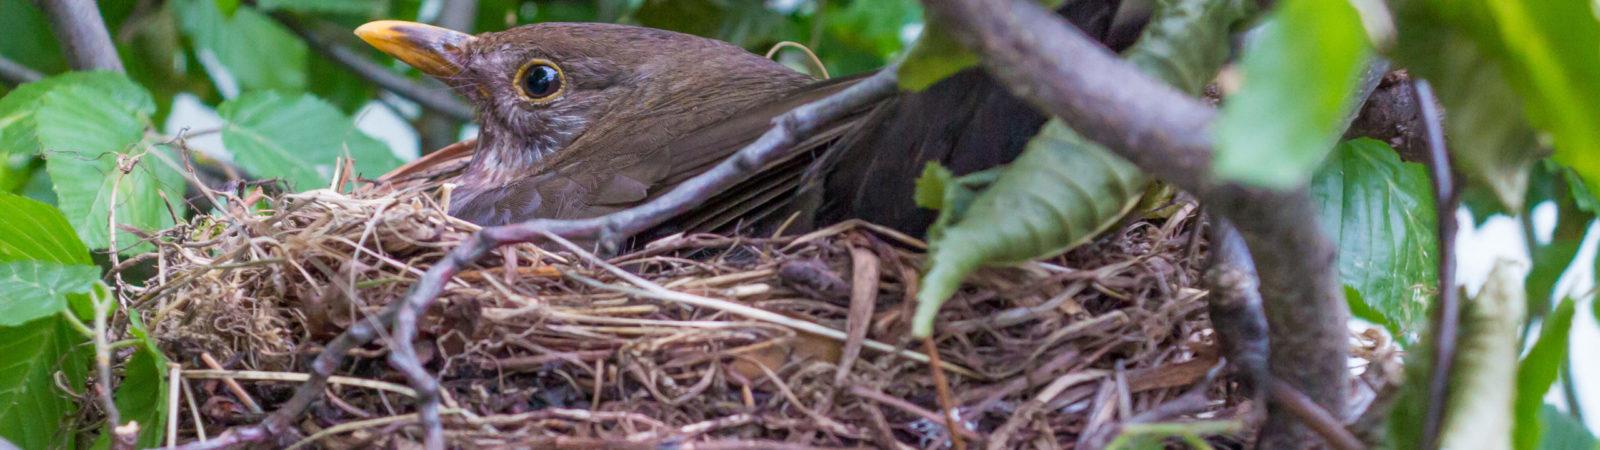 Amsel im Nest